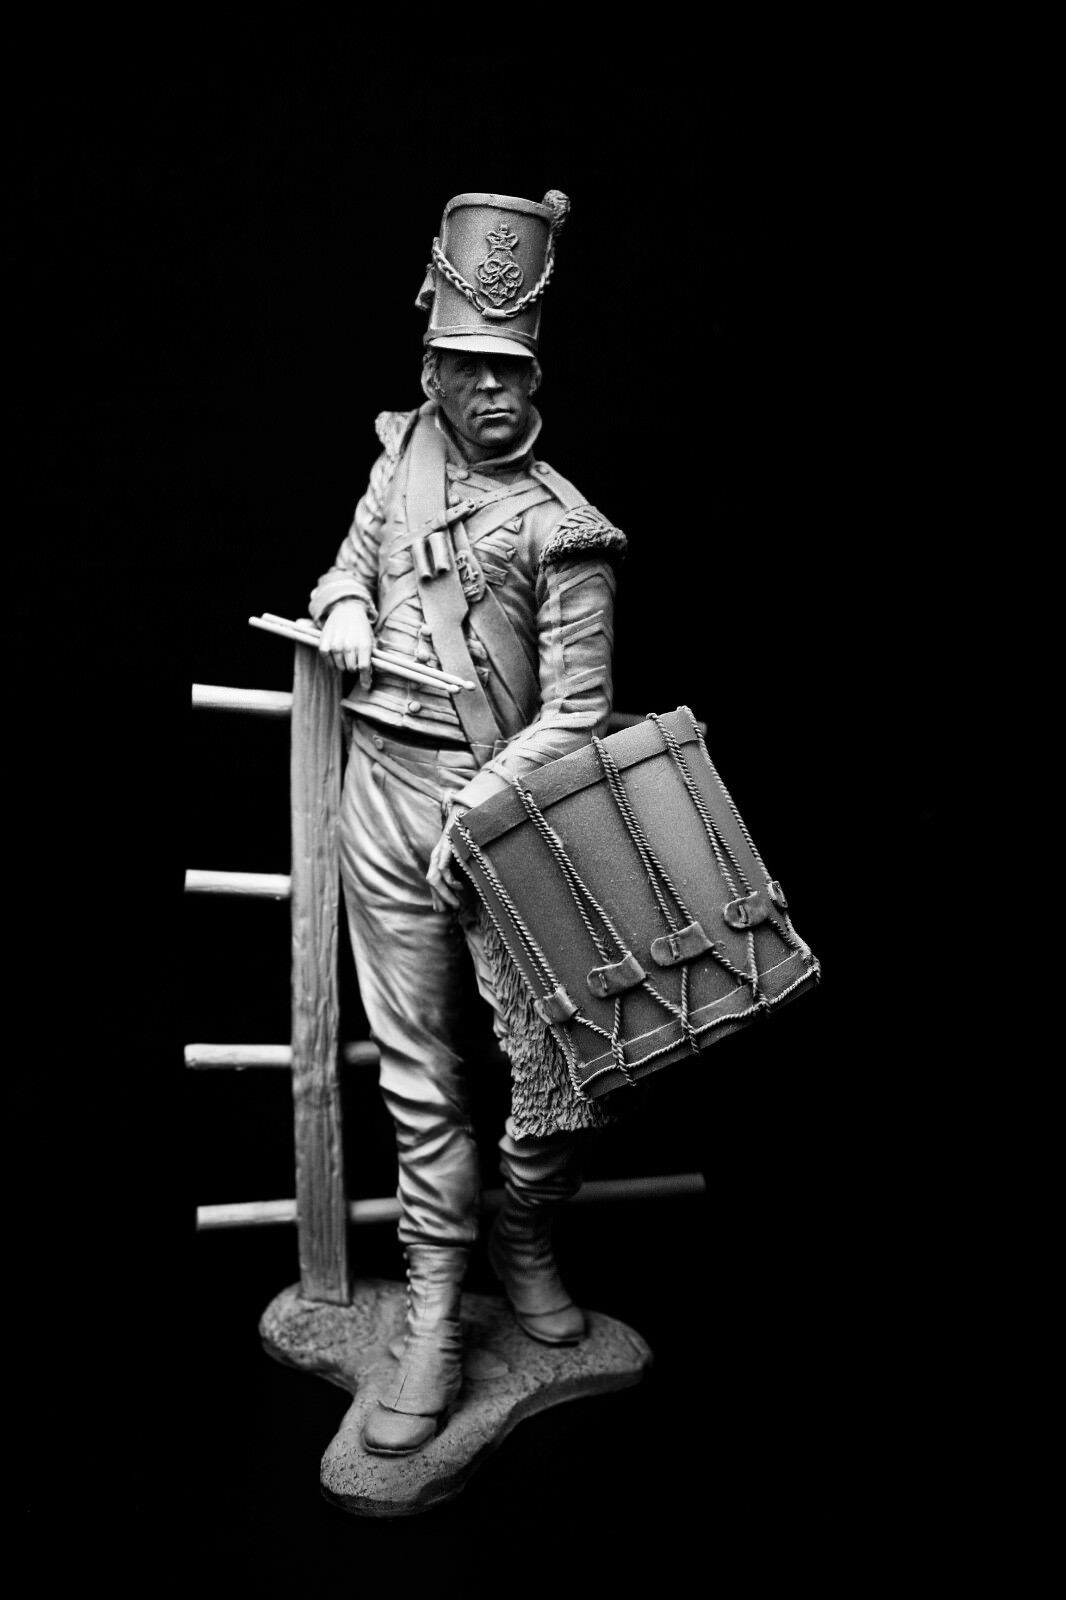 200mm 1 9 Drummer of the 44th Essex, Waterloo, 1815, sculpted by Carl Reid